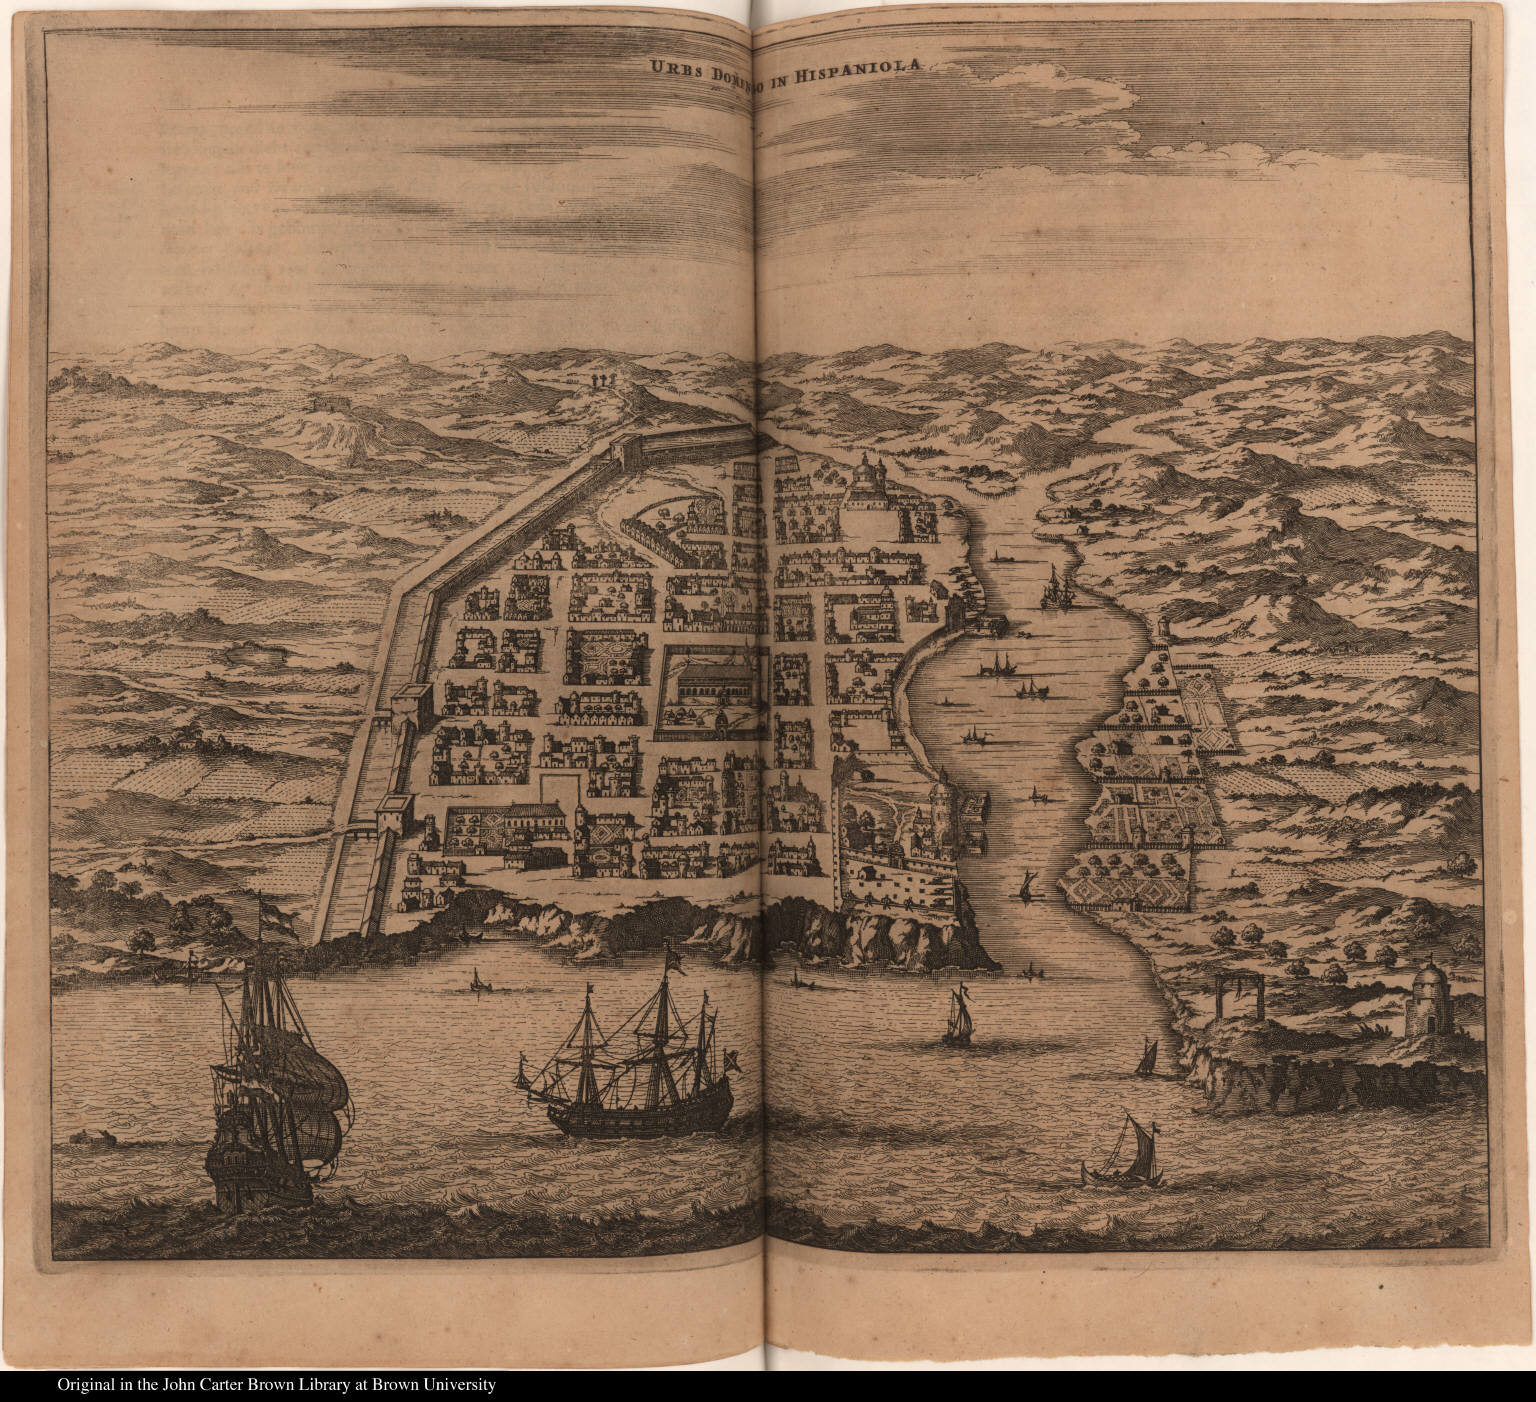 Urbs Domingo in Hispaniola